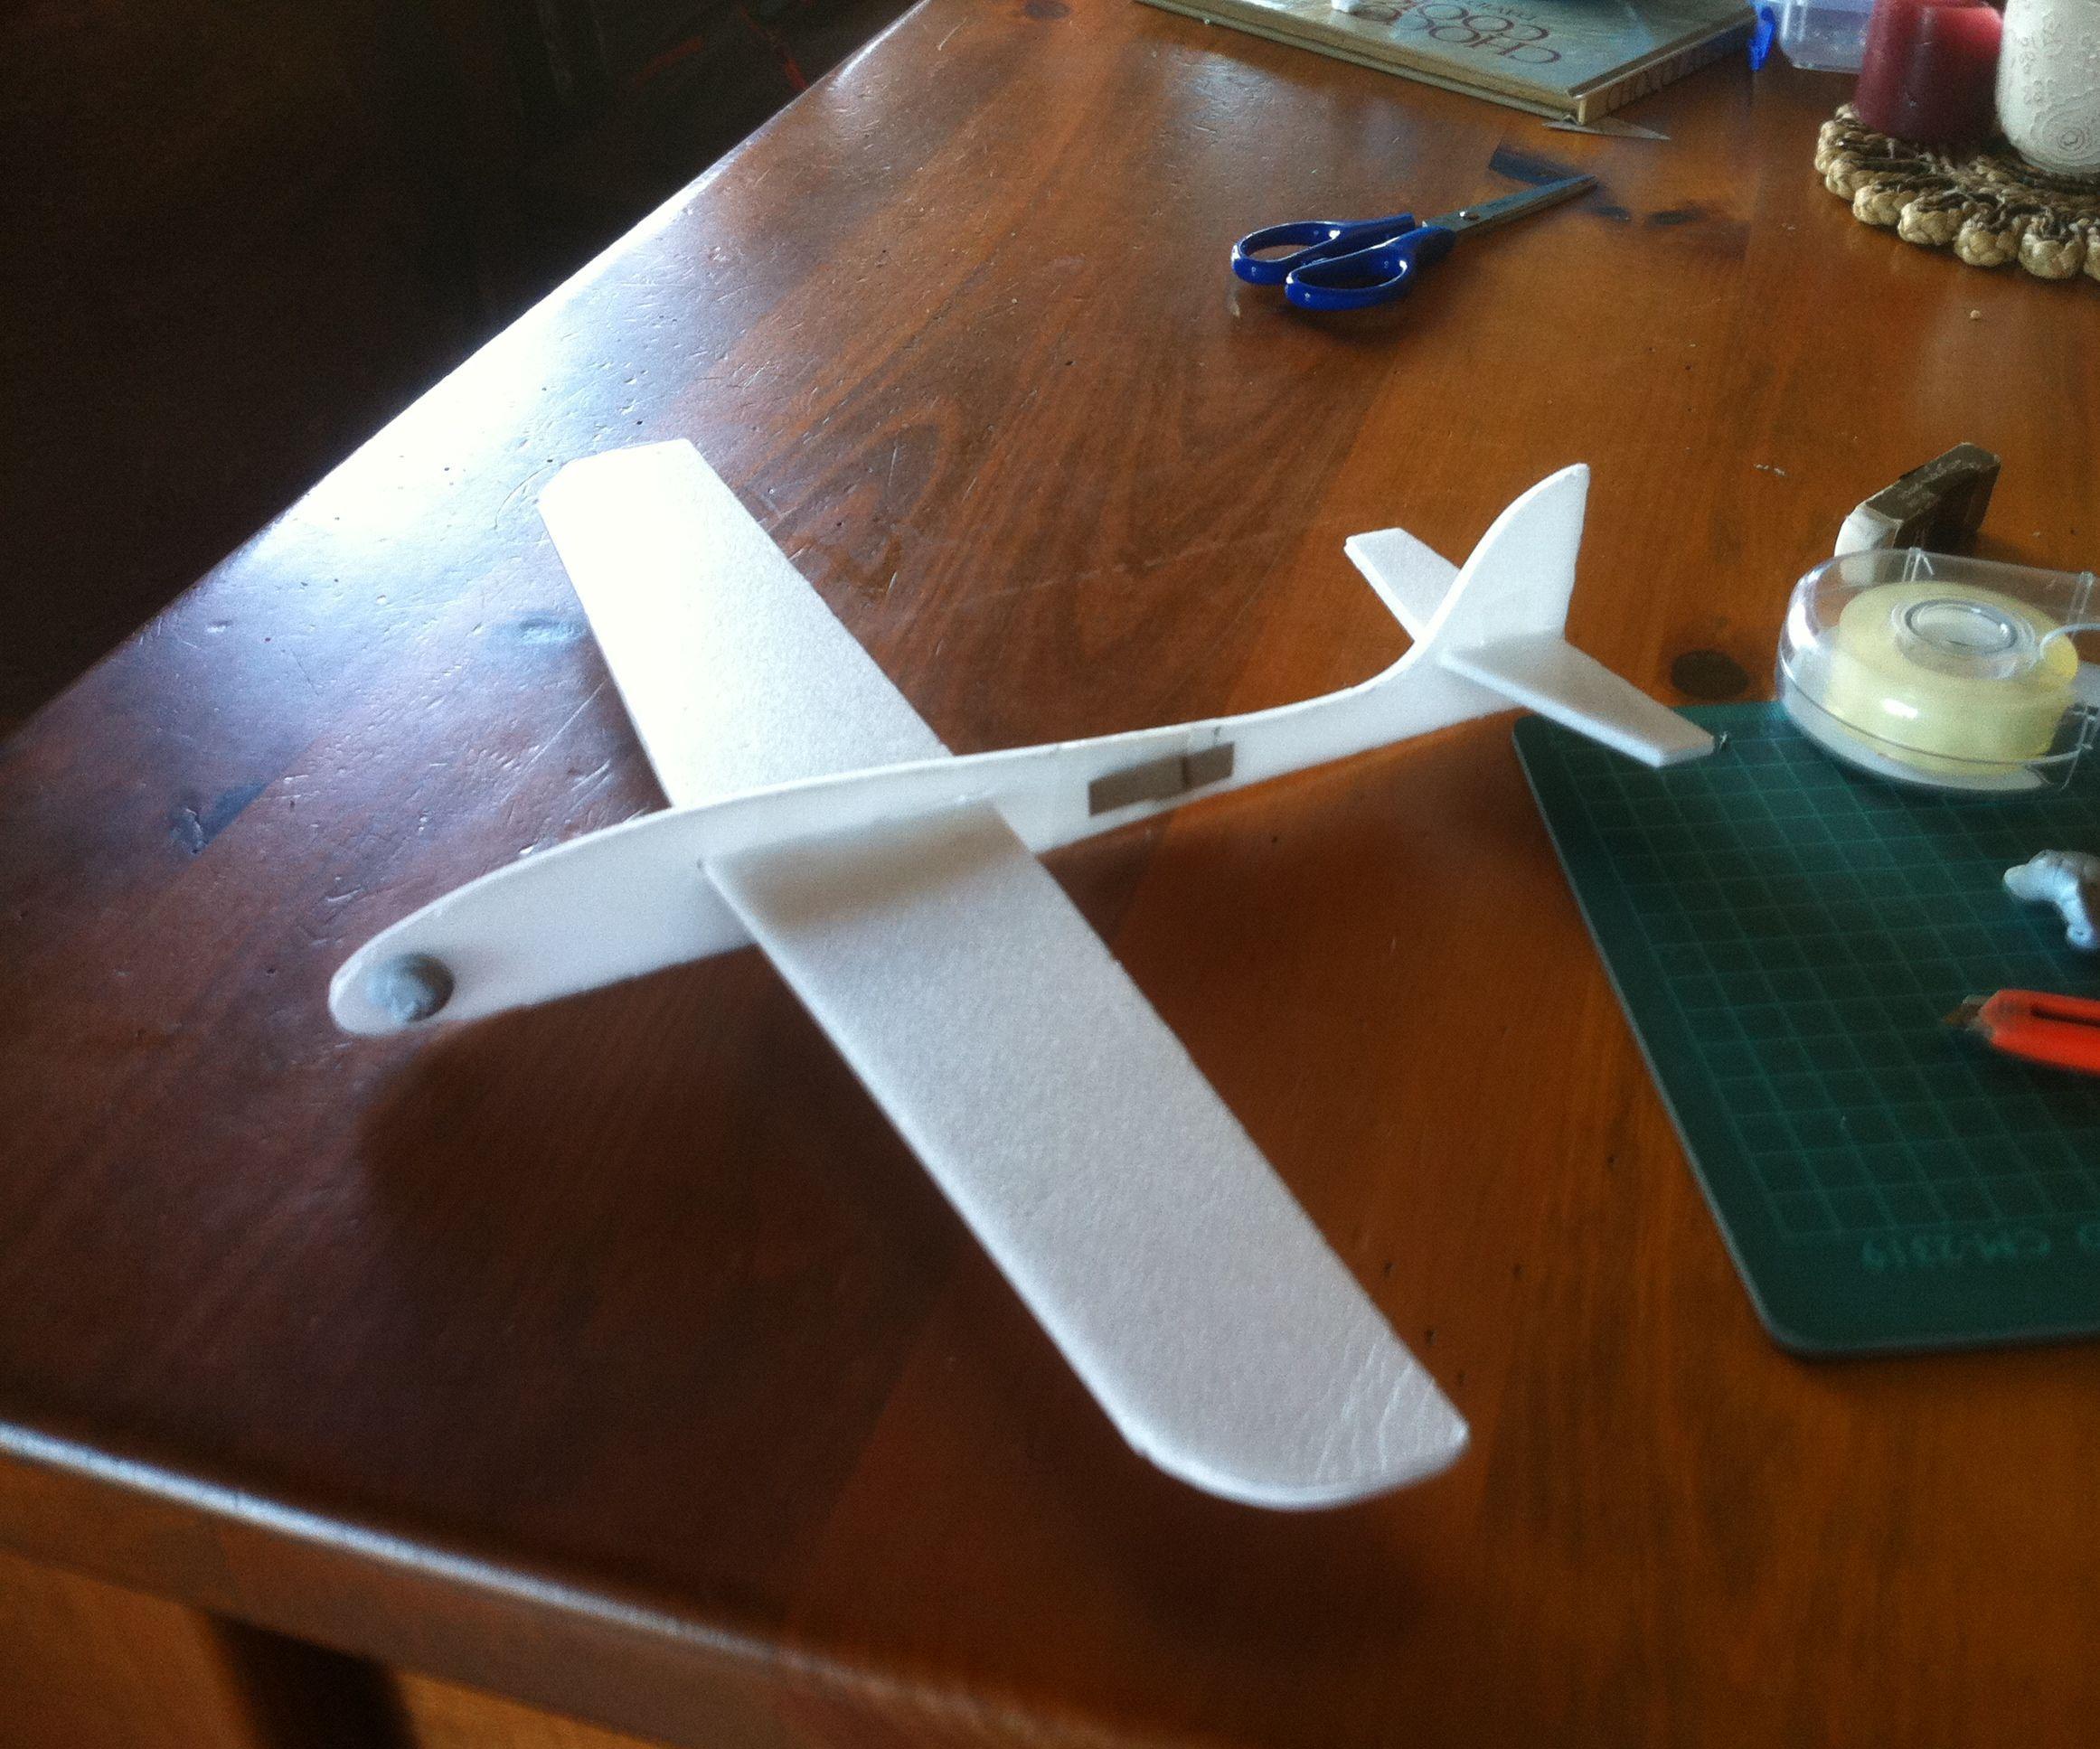 Kids Home Made Glider Using Depron Foam: 4 Steps